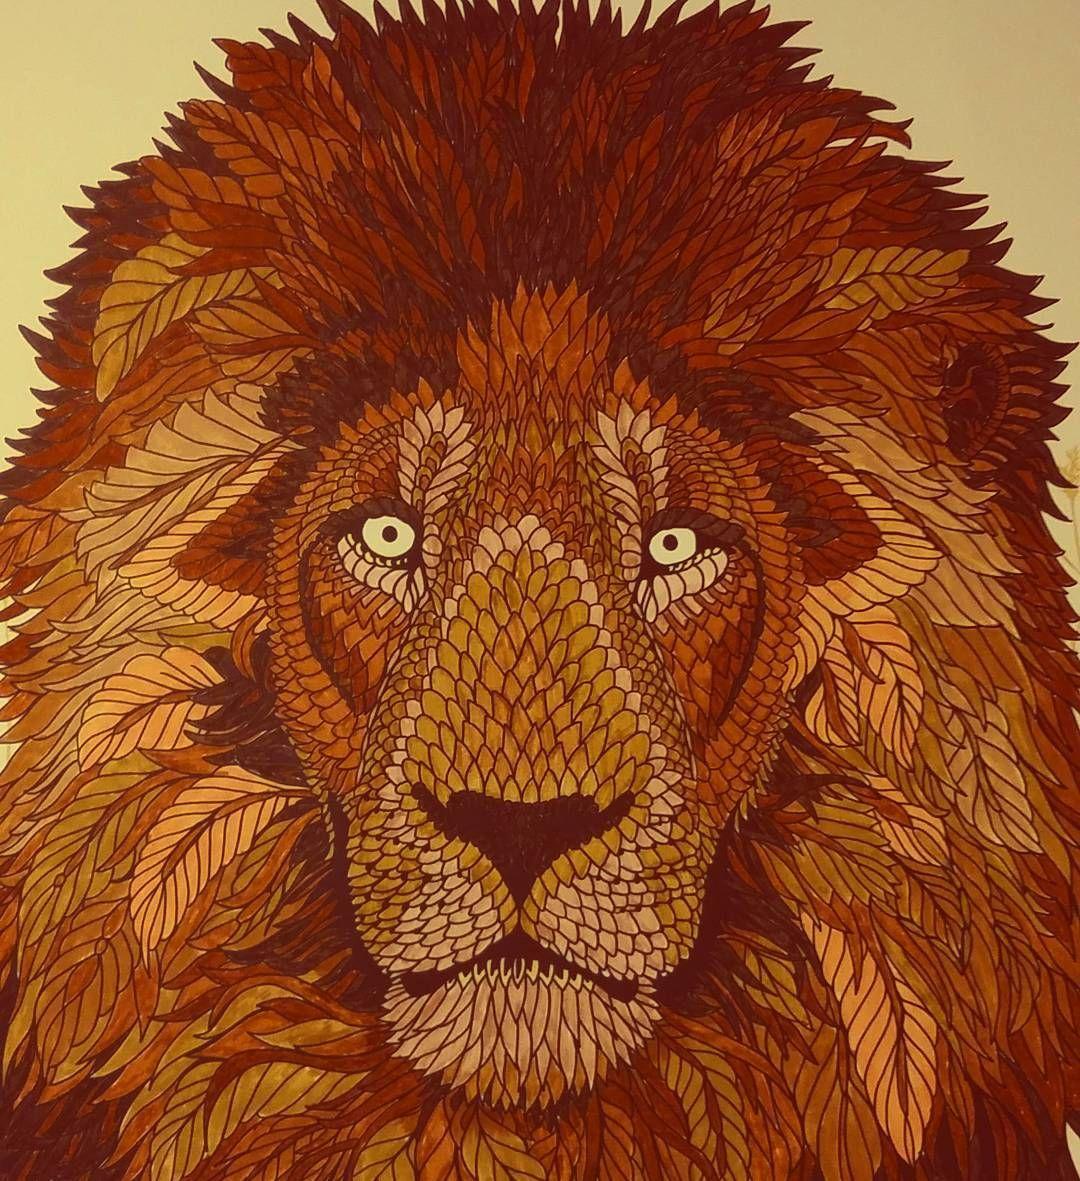 Pin by doogie doo on menag pinterest lions color pencil